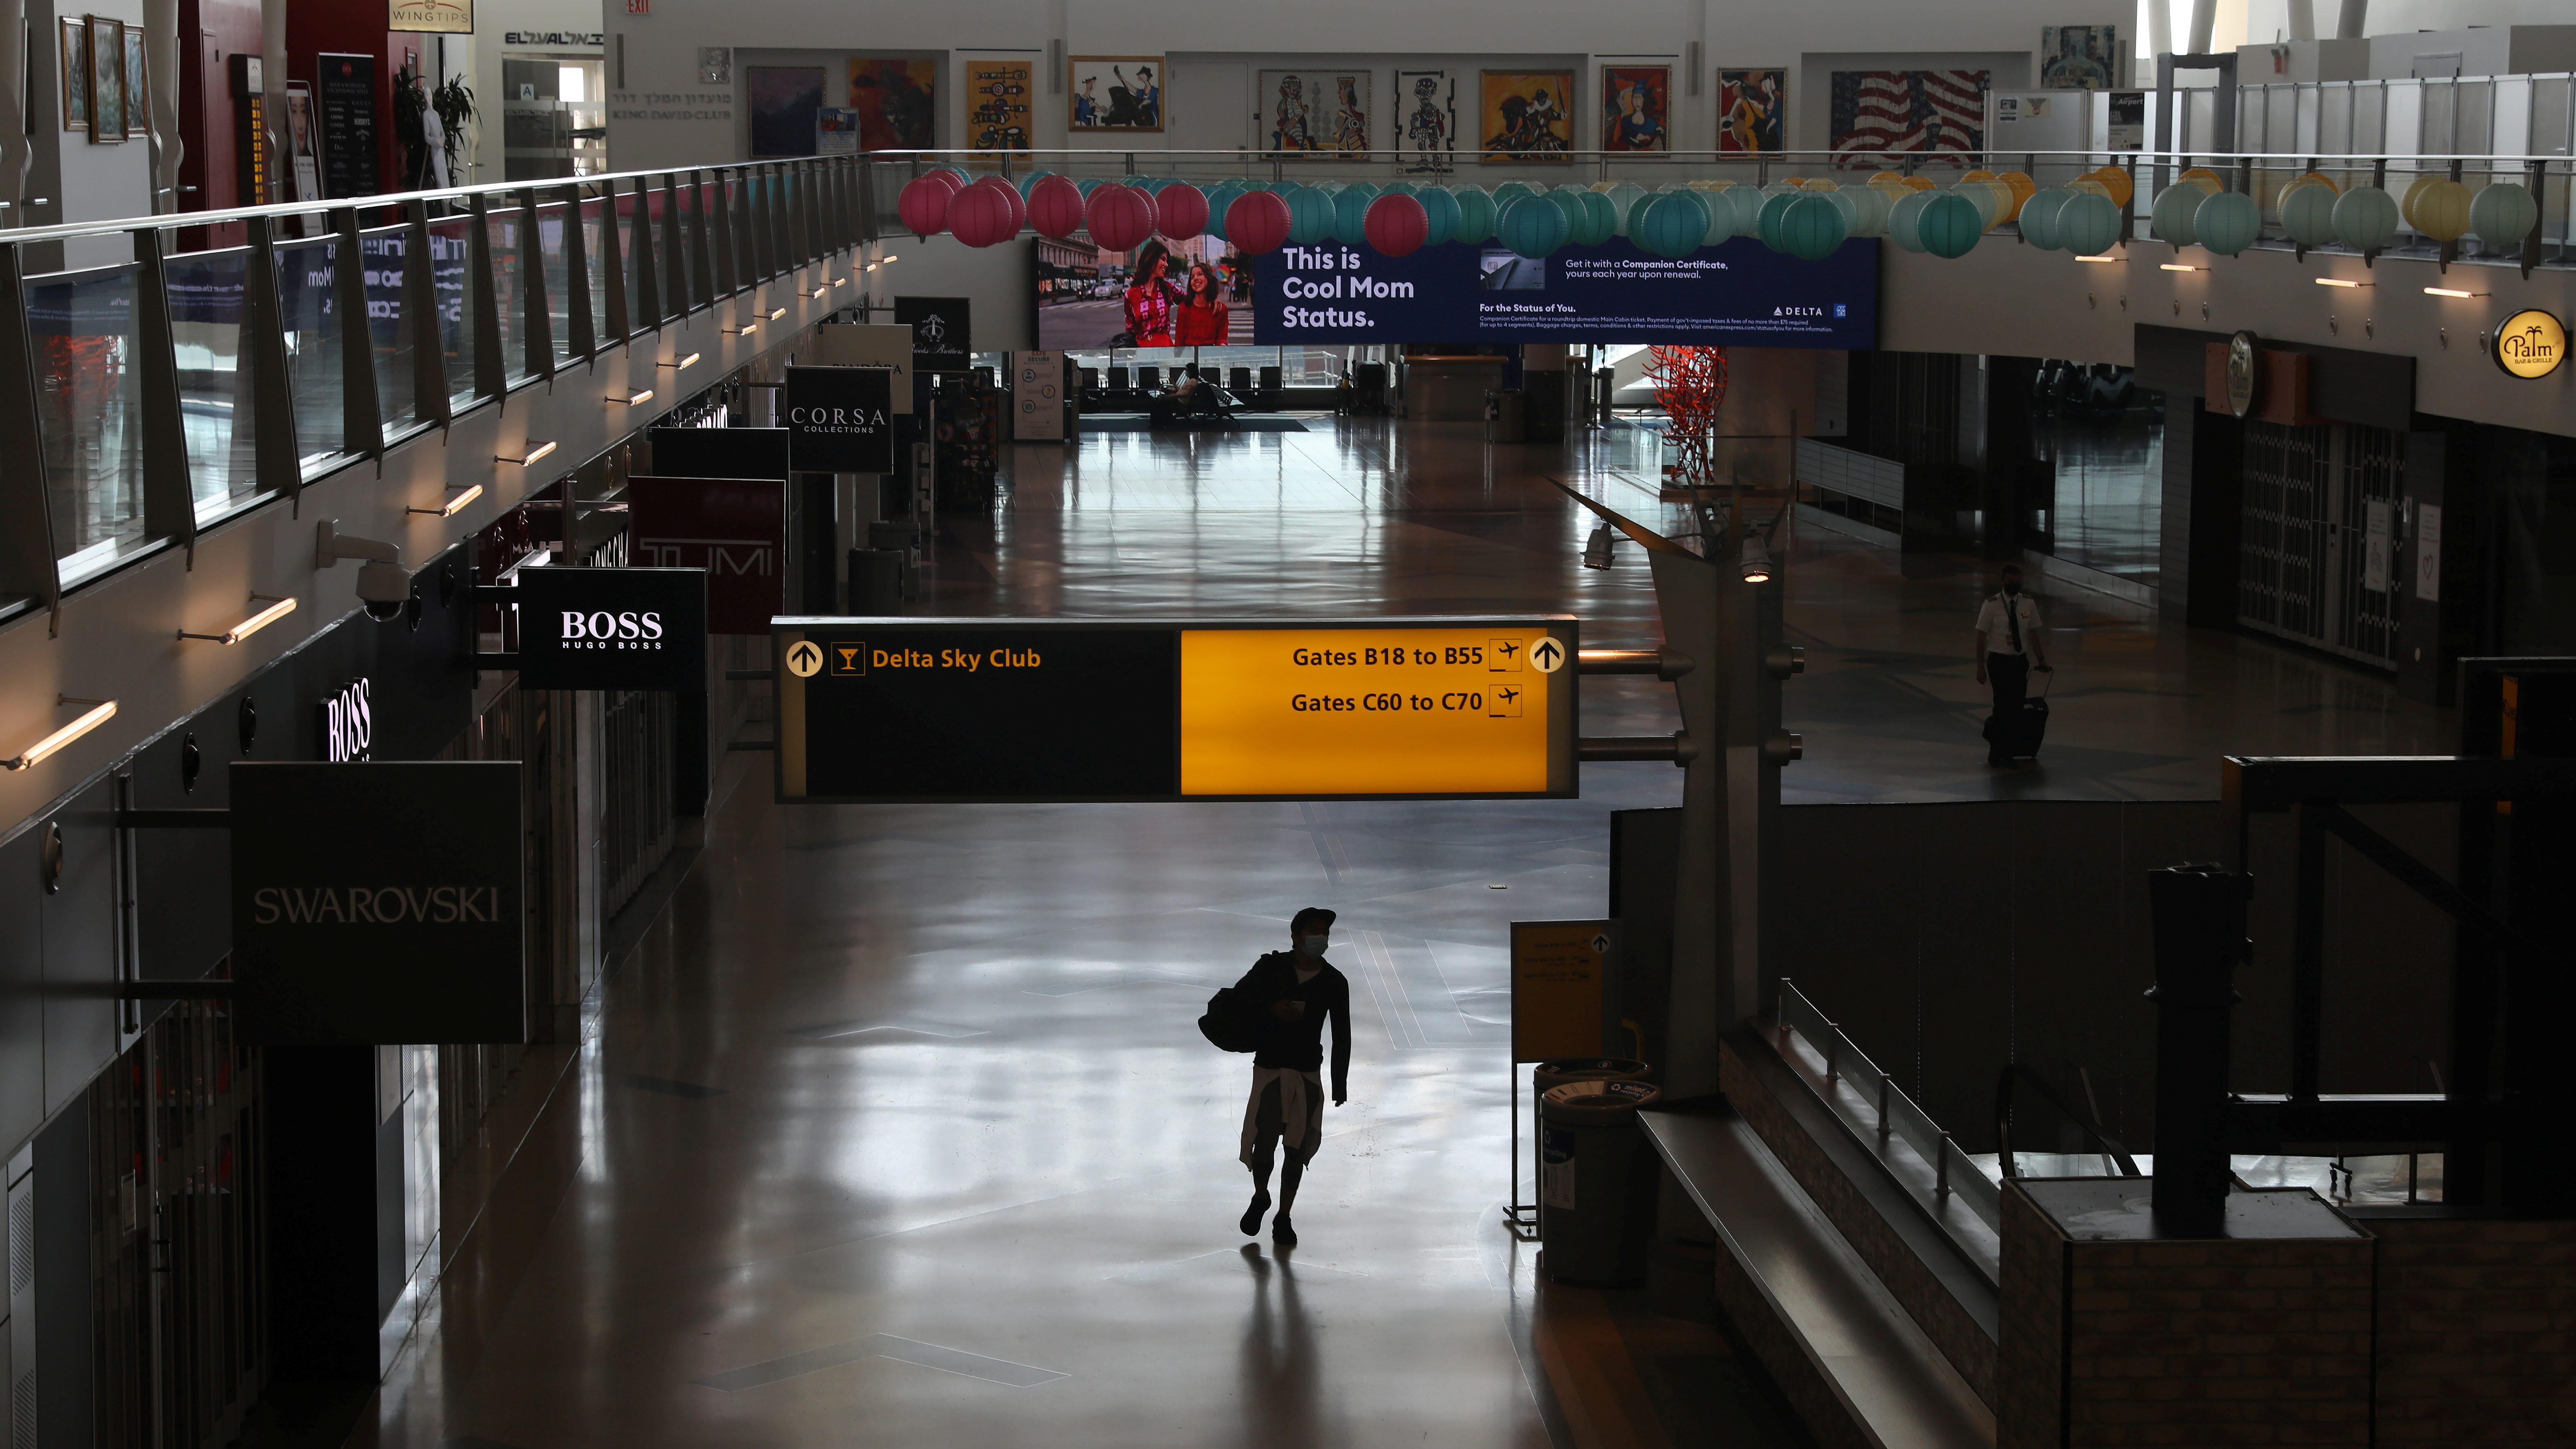 An air traveler walks through a terminal as the coronavirus disease (COVID-19) outbreak continues, at New York's JFK International Airport in New York, U.S., May 15, 2020. REUTERS/Shannon Stapleton